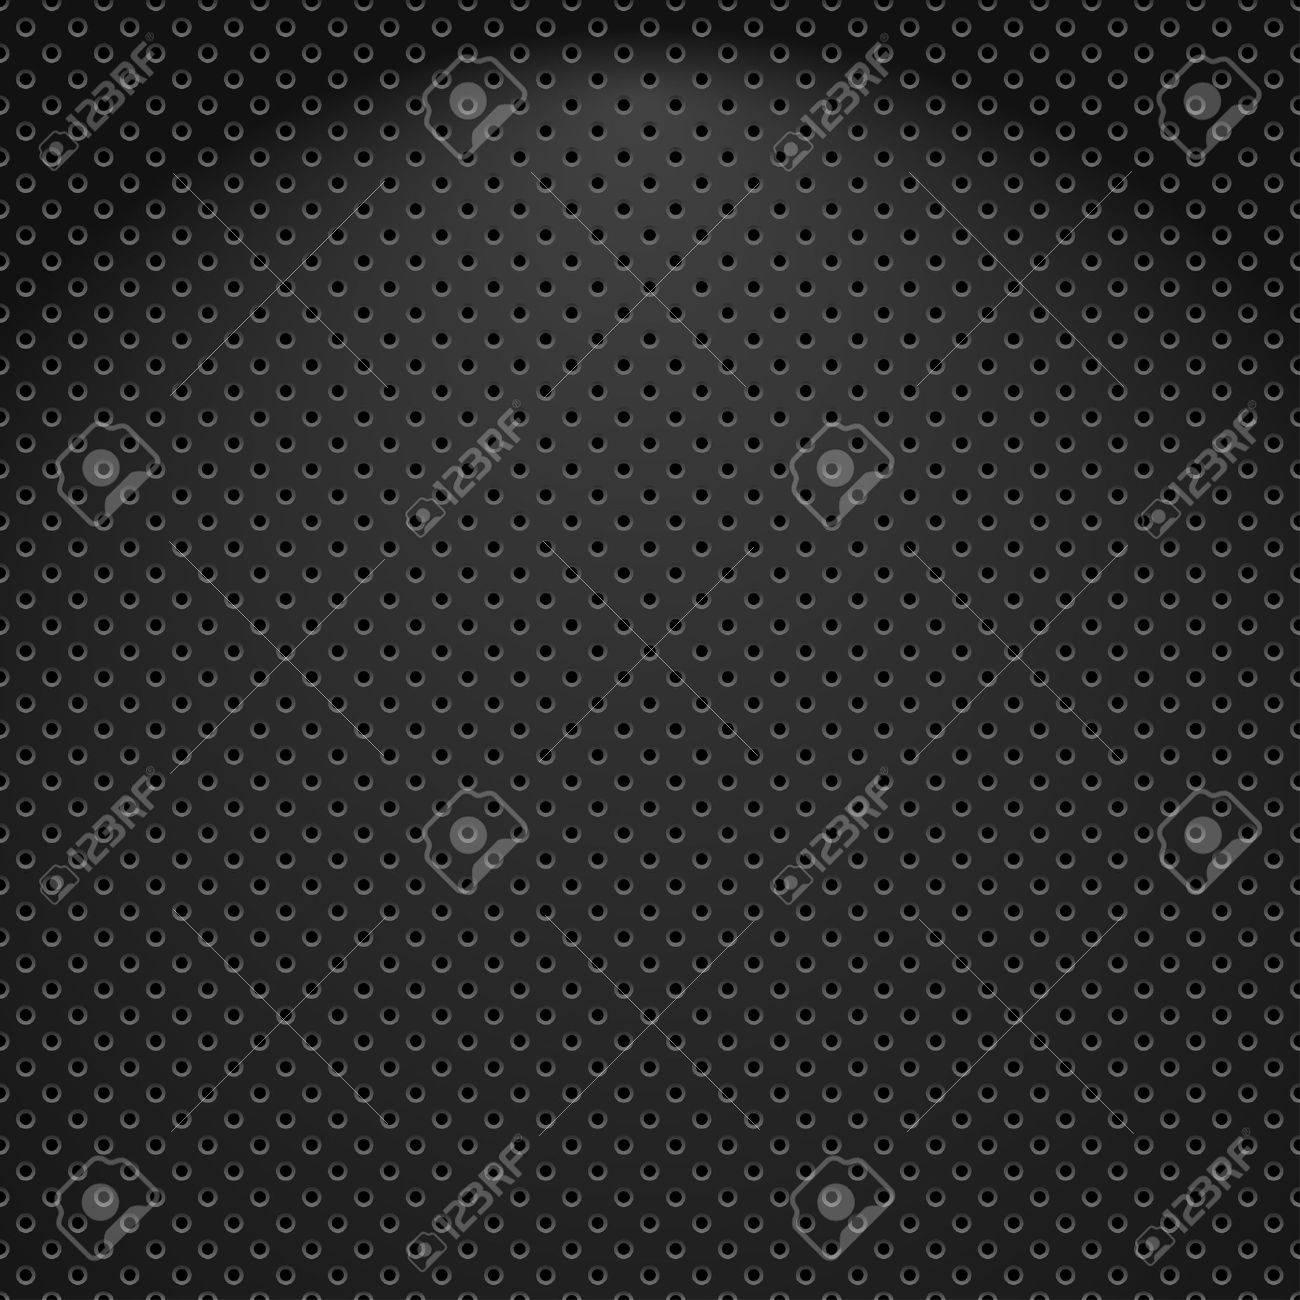 Metallic textured background, seamless pattern Stock Vector - 15325775